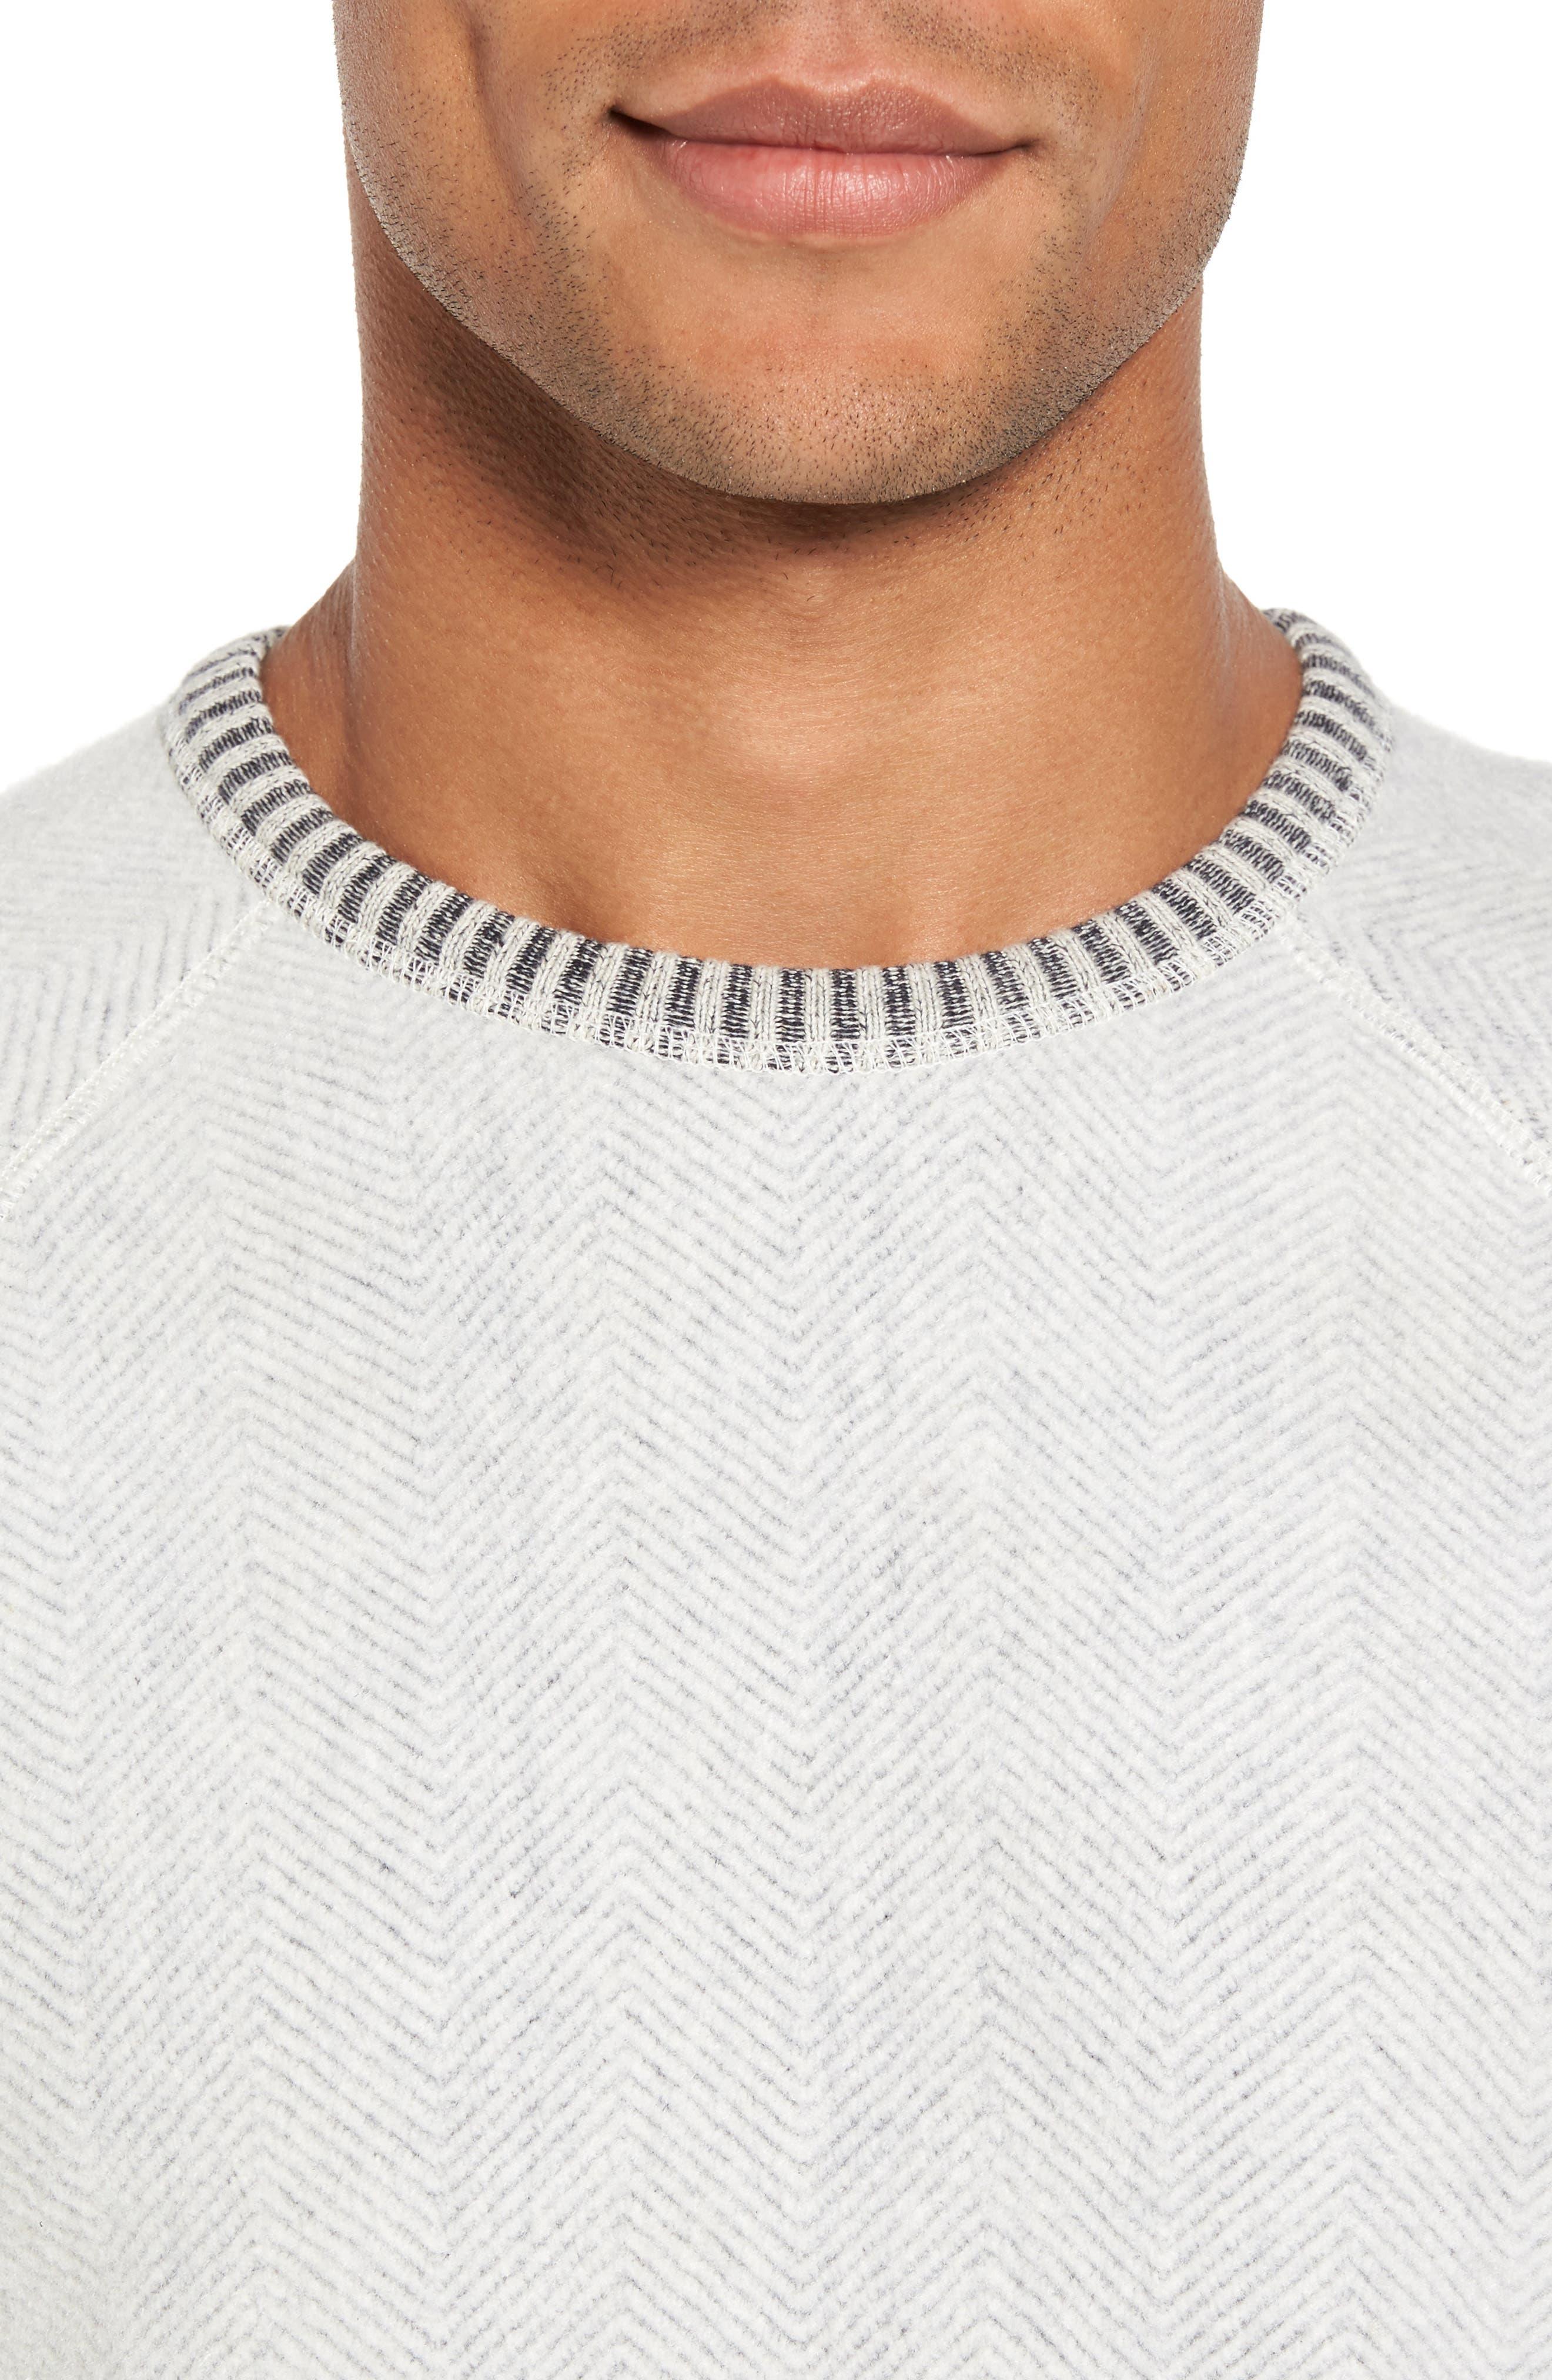 Brushed Fleece Sweatshirt,                             Alternate thumbnail 4, color,                             Ivory Egret